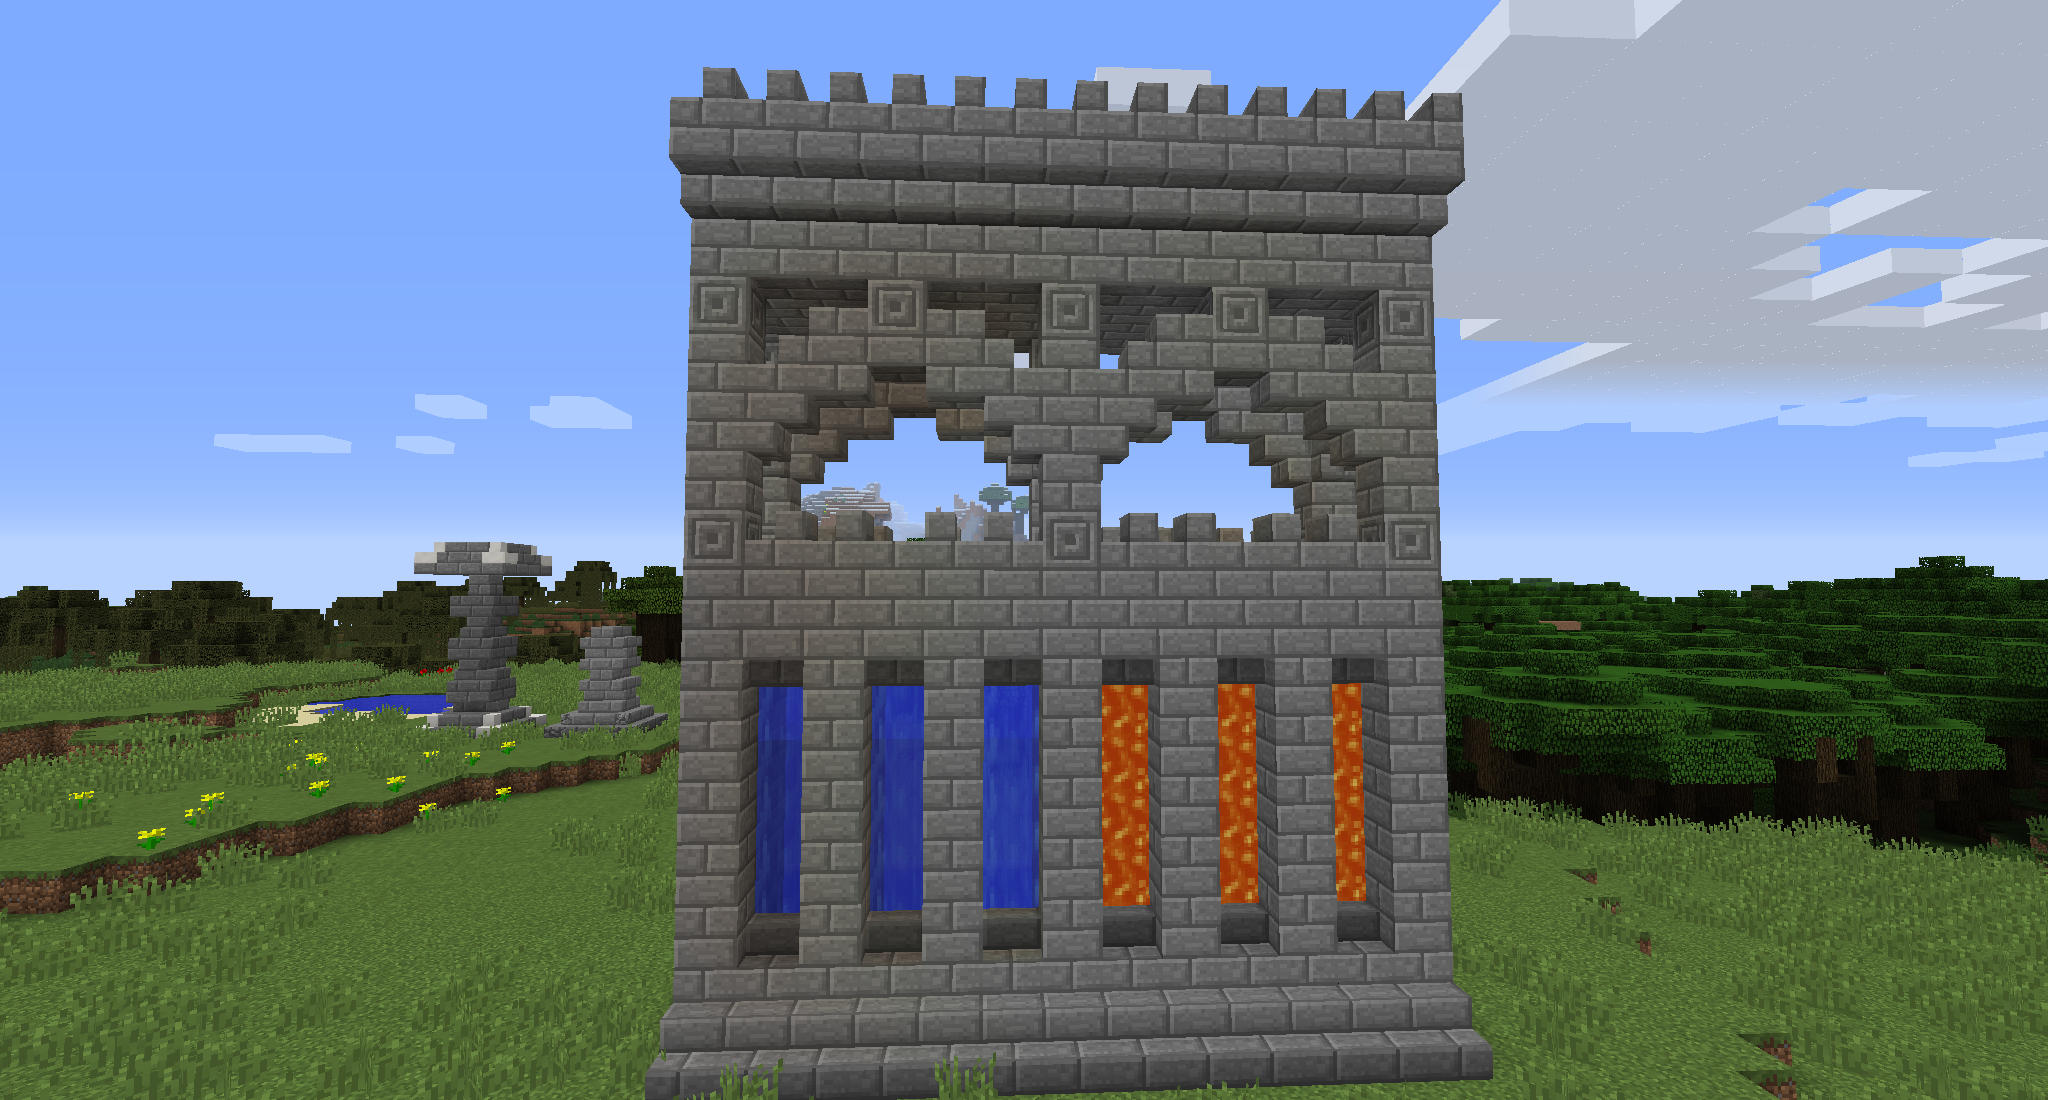 Beautiful Minecraft Tips, Minecraft Blueprints, Minecraft Stuff, Minecraft  Architecture, Minecraft Buildings, Minecraft Castle Walls, Building Ideas,  Block Party, ...